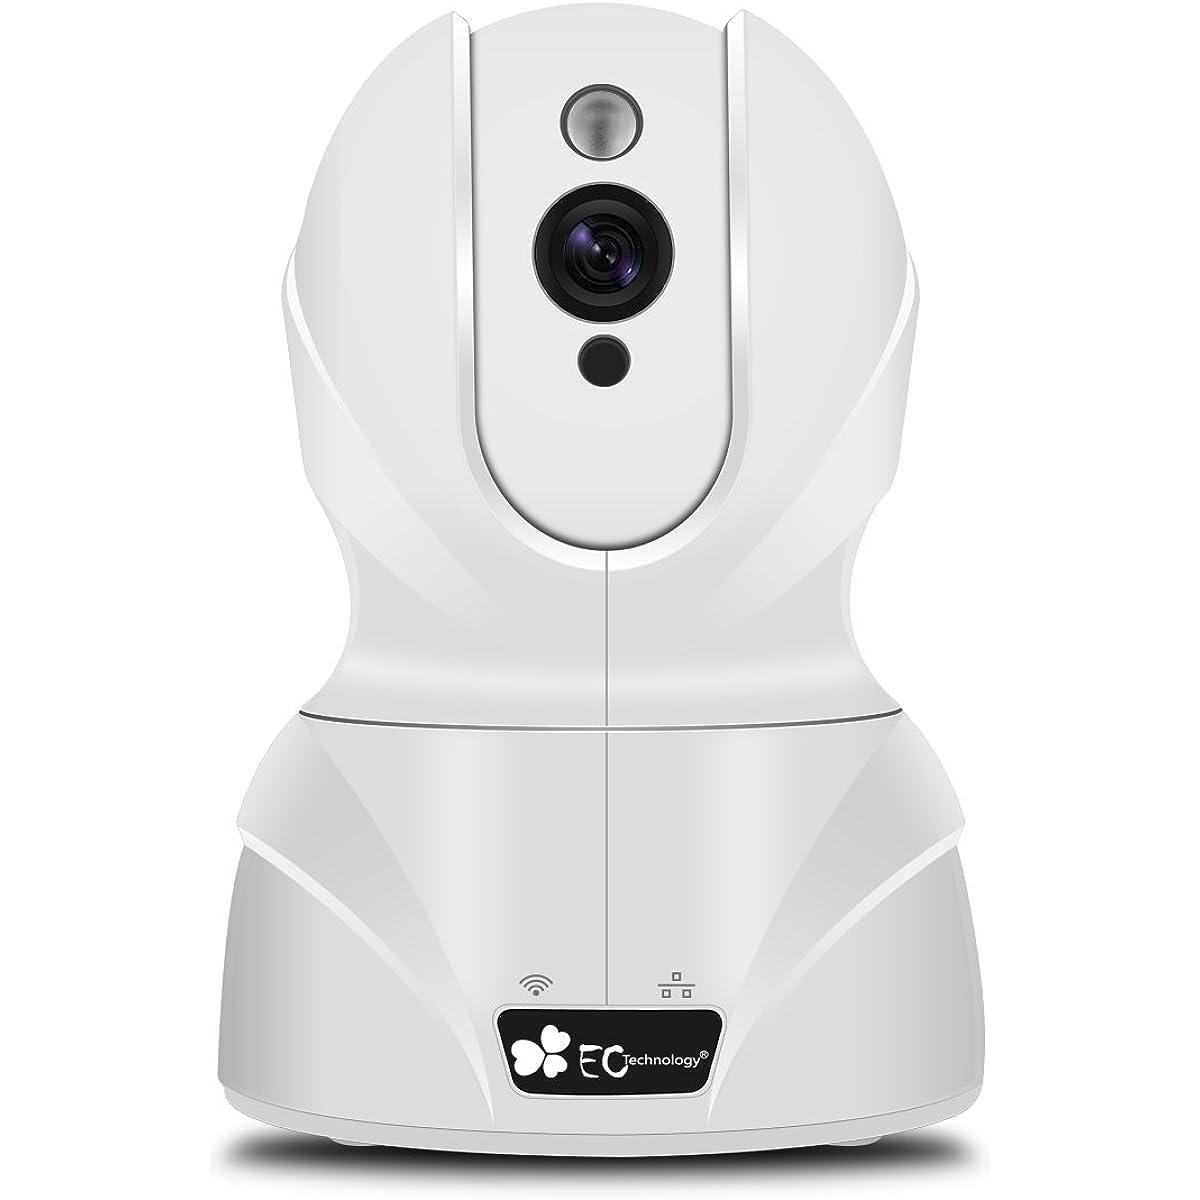 EC Technology Kabellose 720P HD